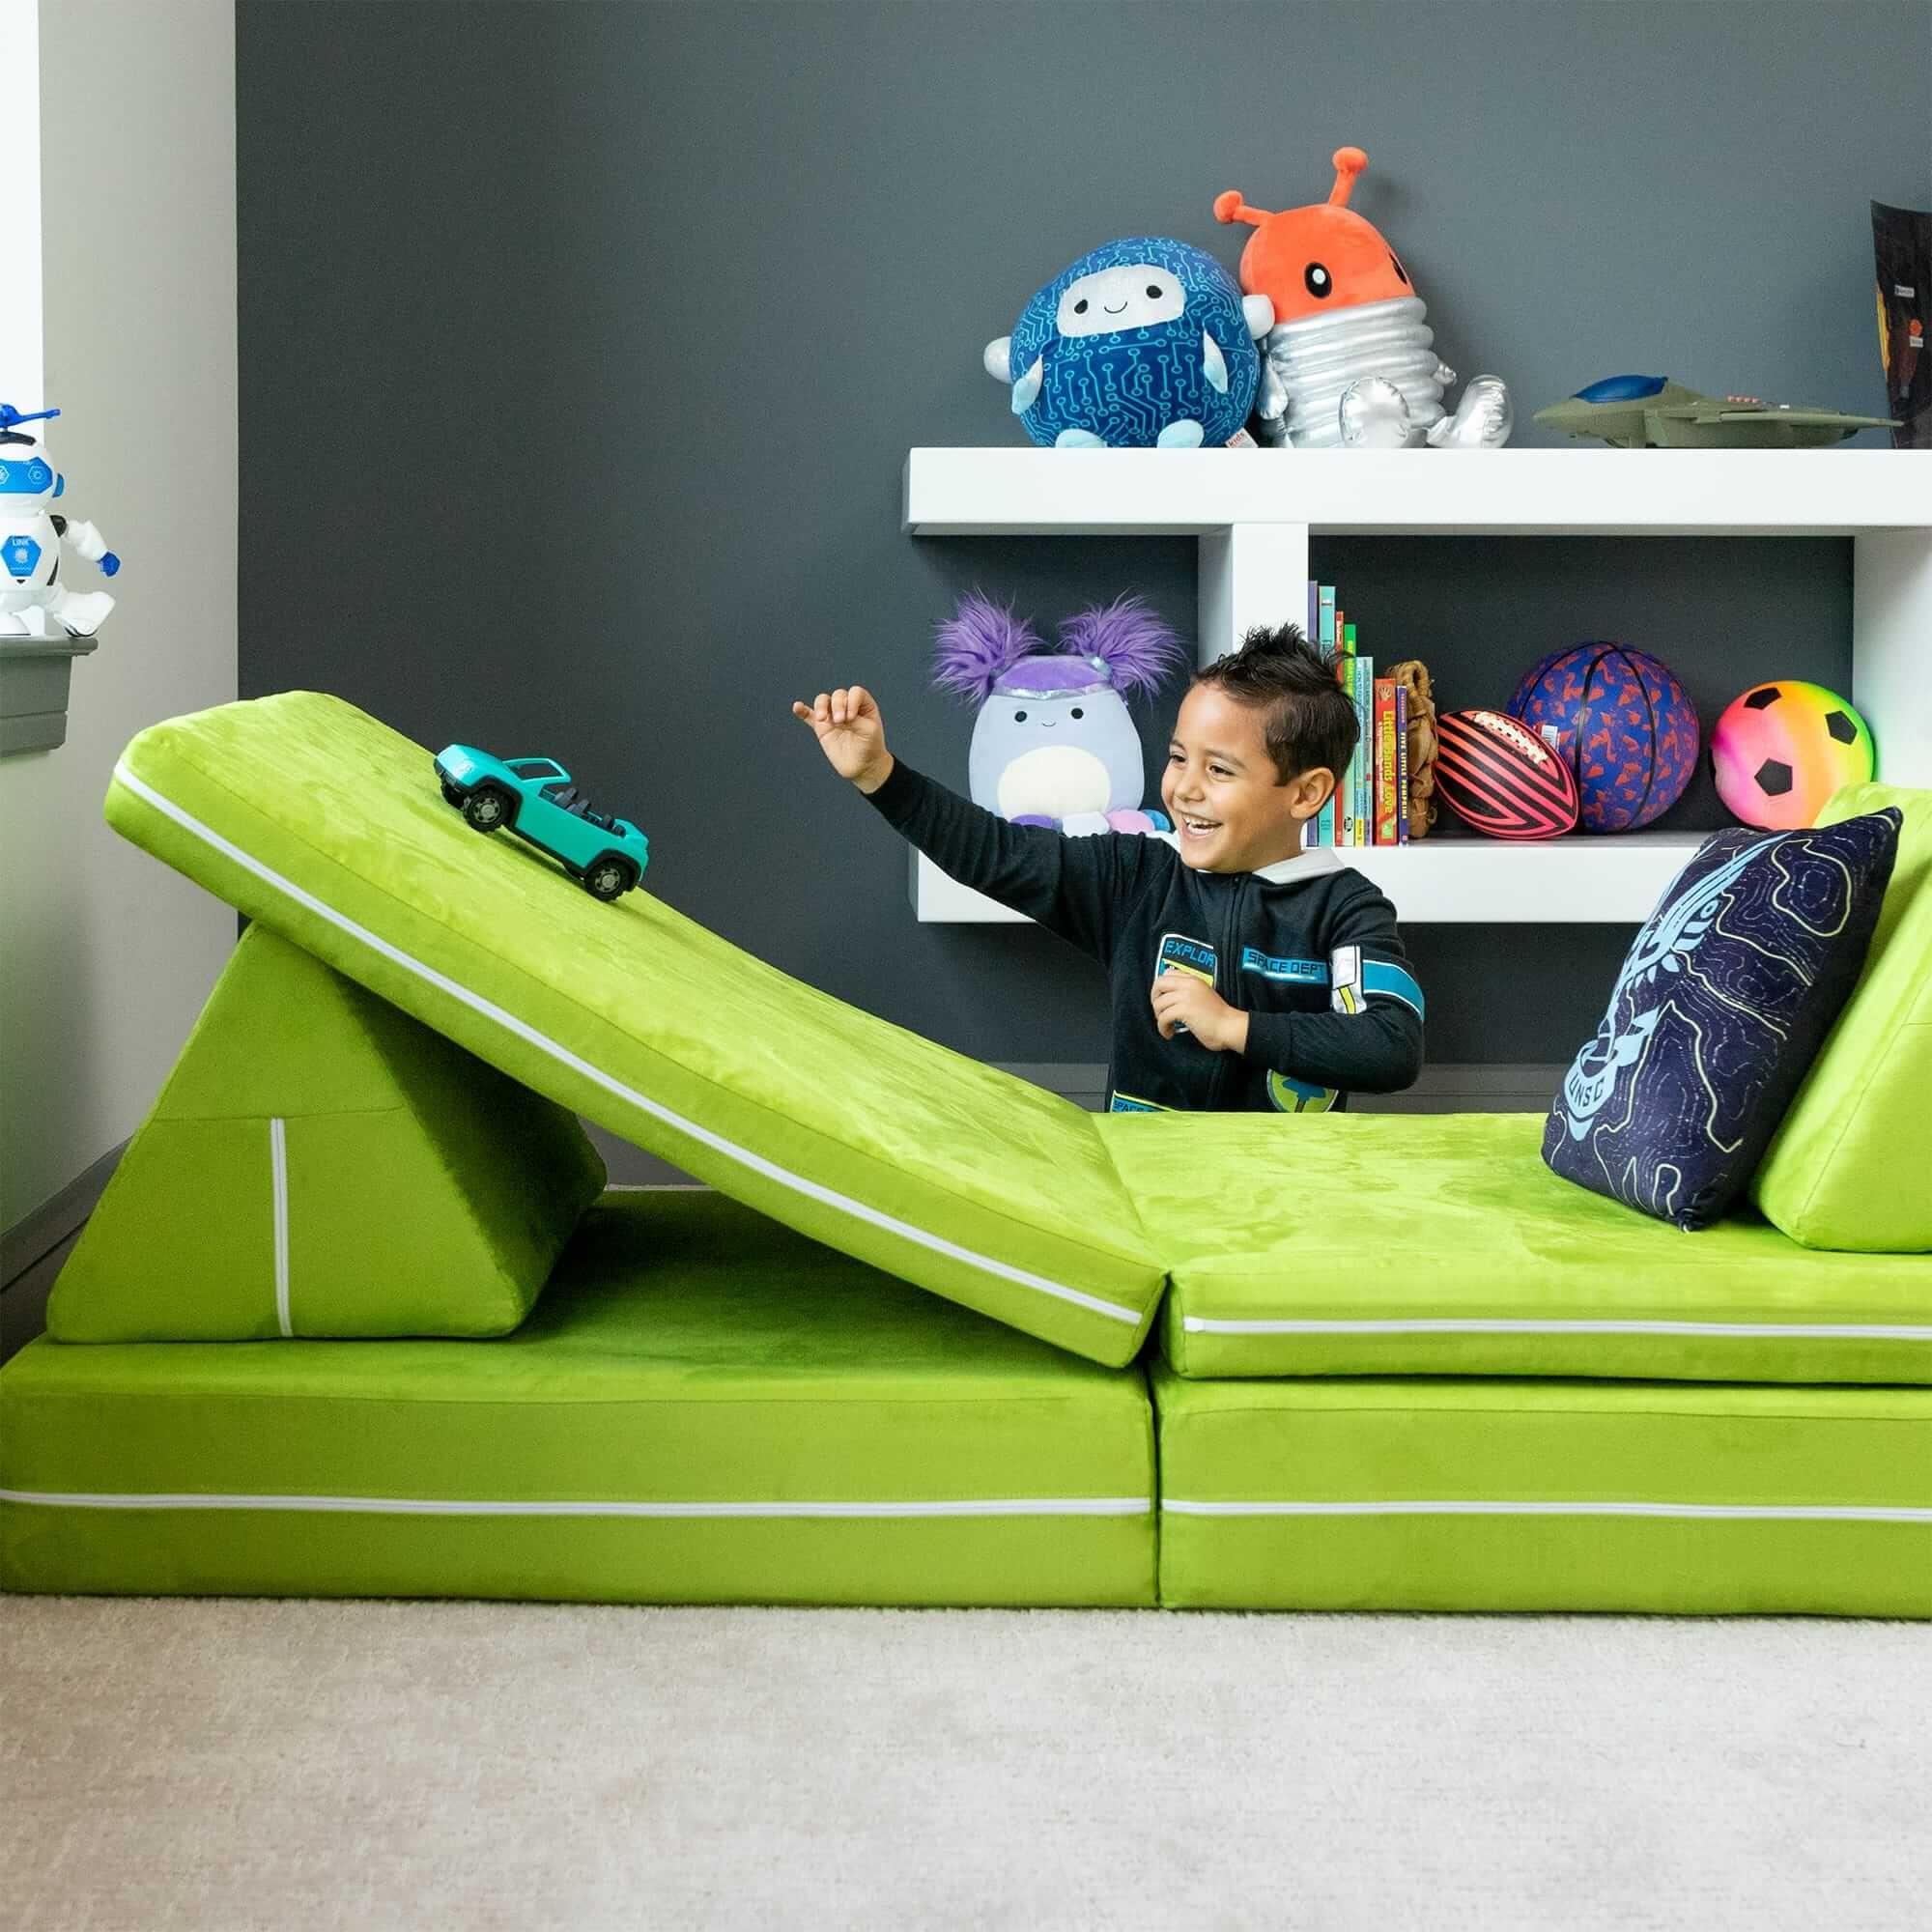 Zipline Playscape Kids Play House Fort Indoor Furniture - Light Green